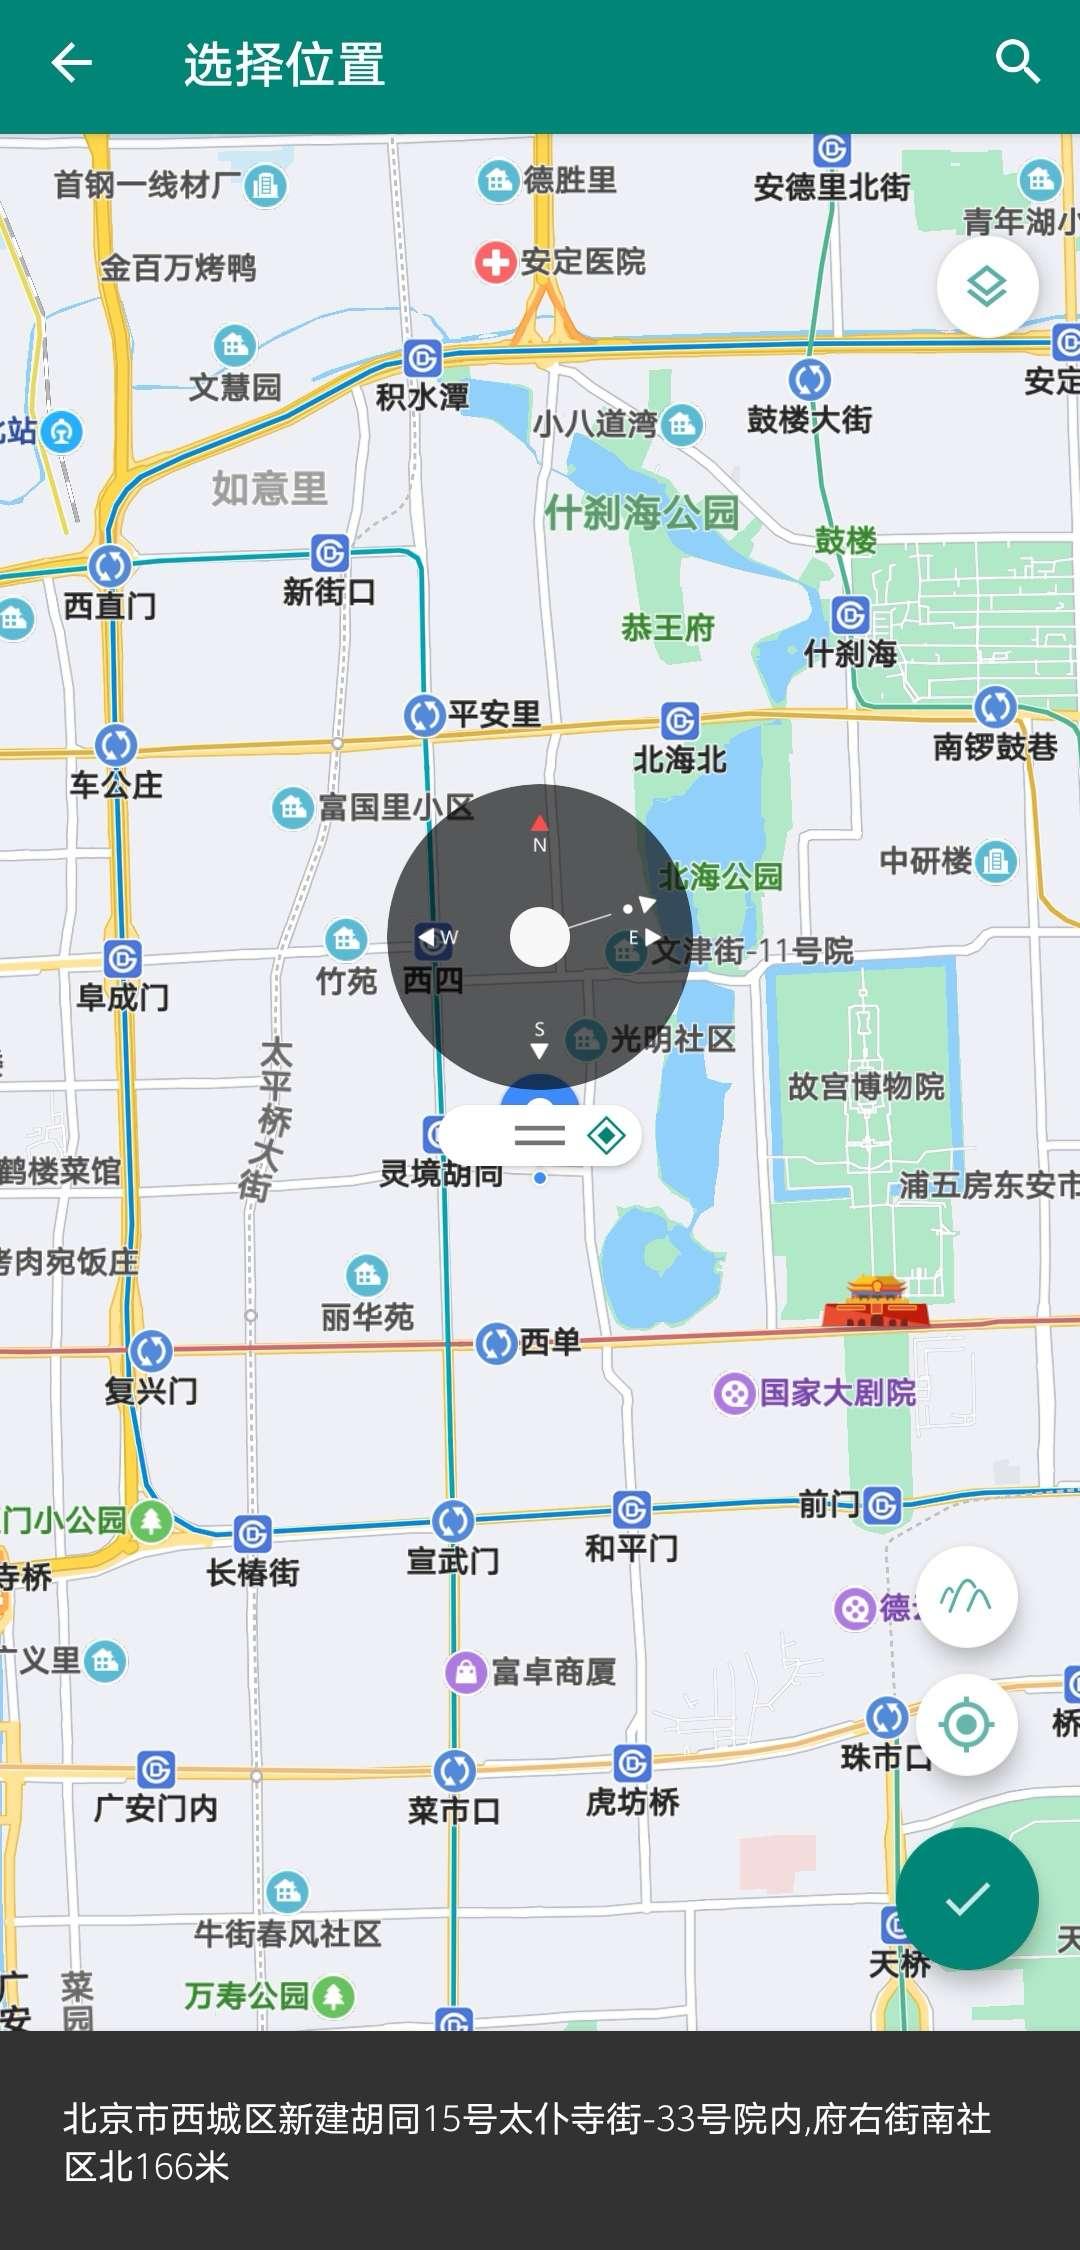 Fake Location模拟位置,虚拟定位软件APP